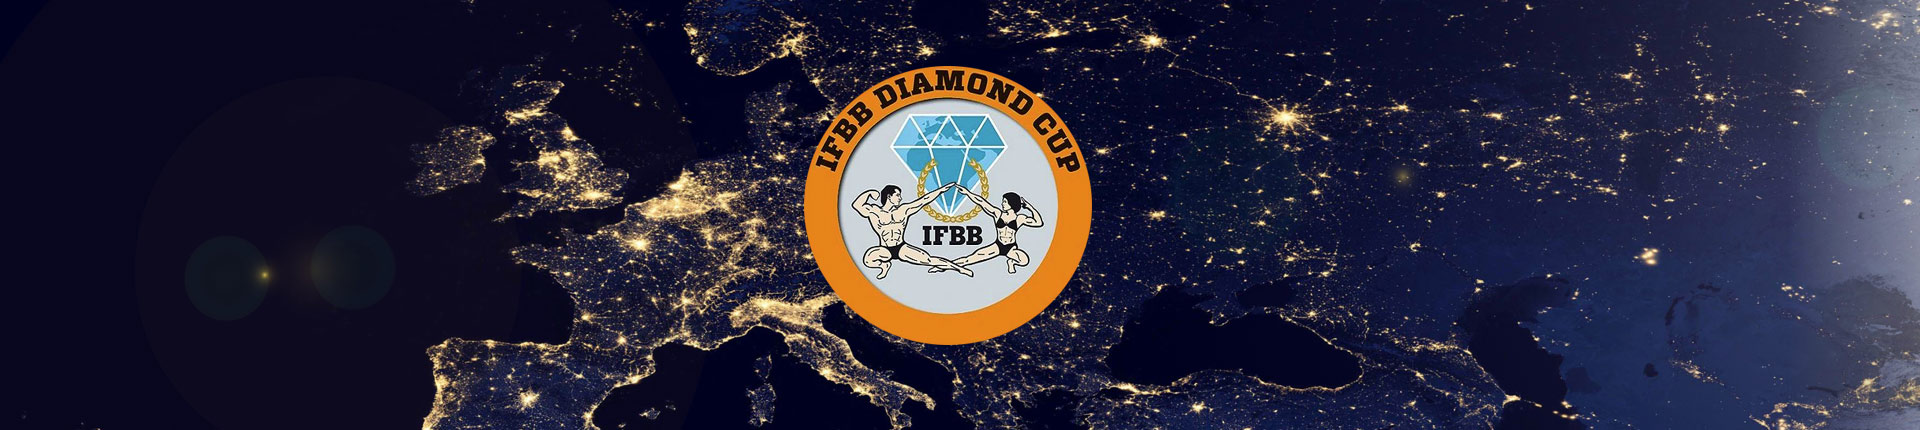 Diamond Cup Warsaw FIWE 2018  - Dzień 1